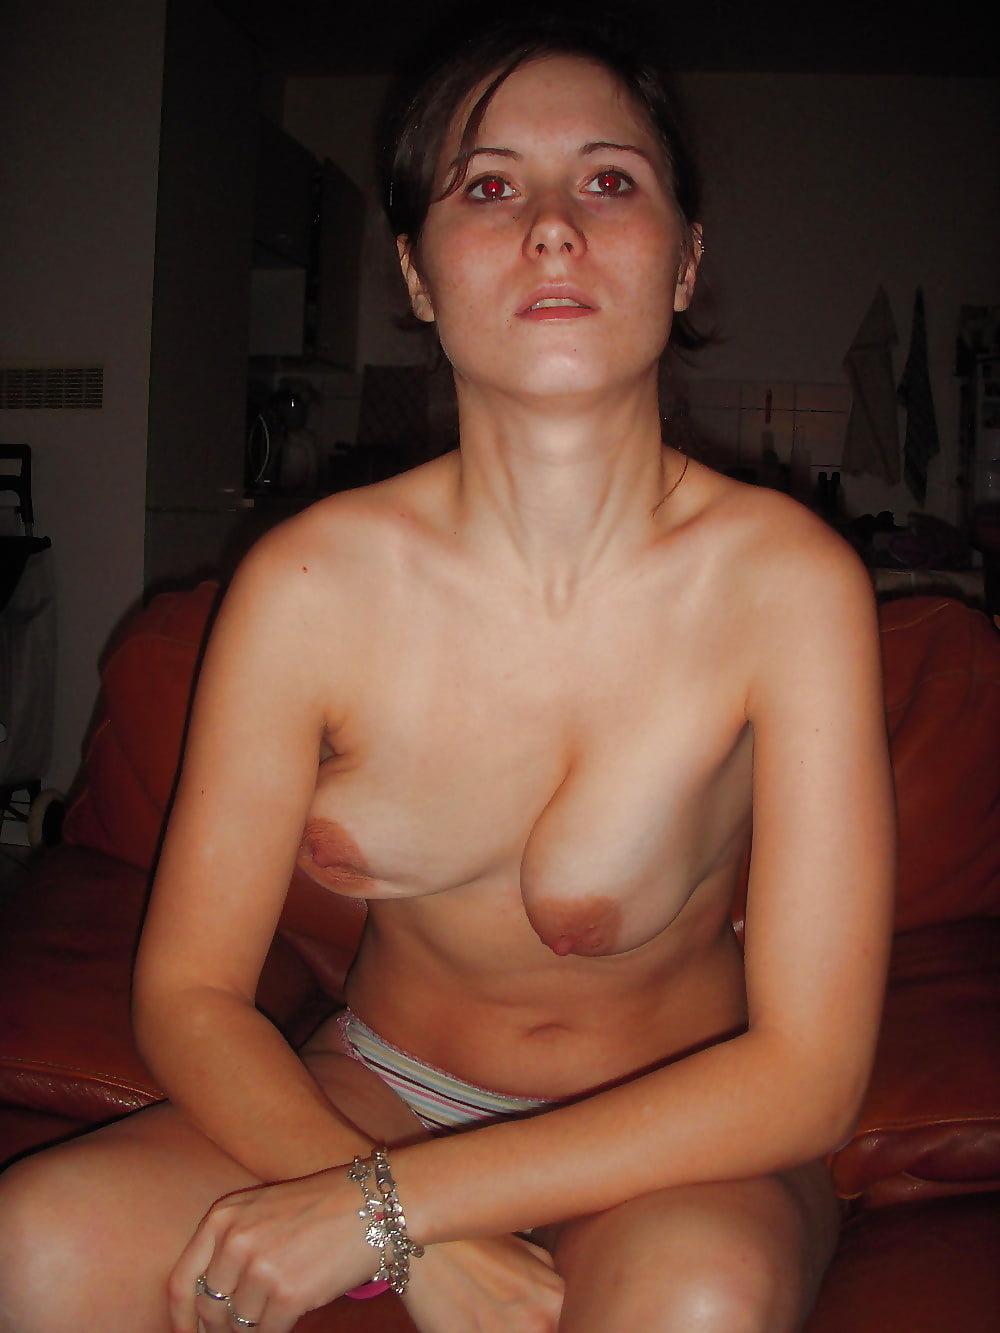 Skinny Milf Slut With Saggy Tits - 38 Bilder - Xhamstercom-6510